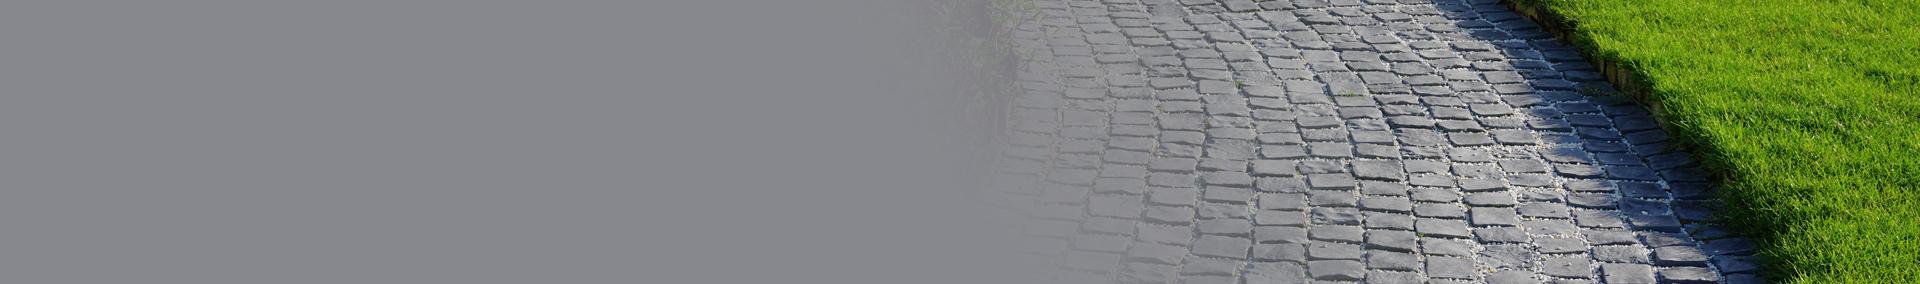 baner kostka granitowa